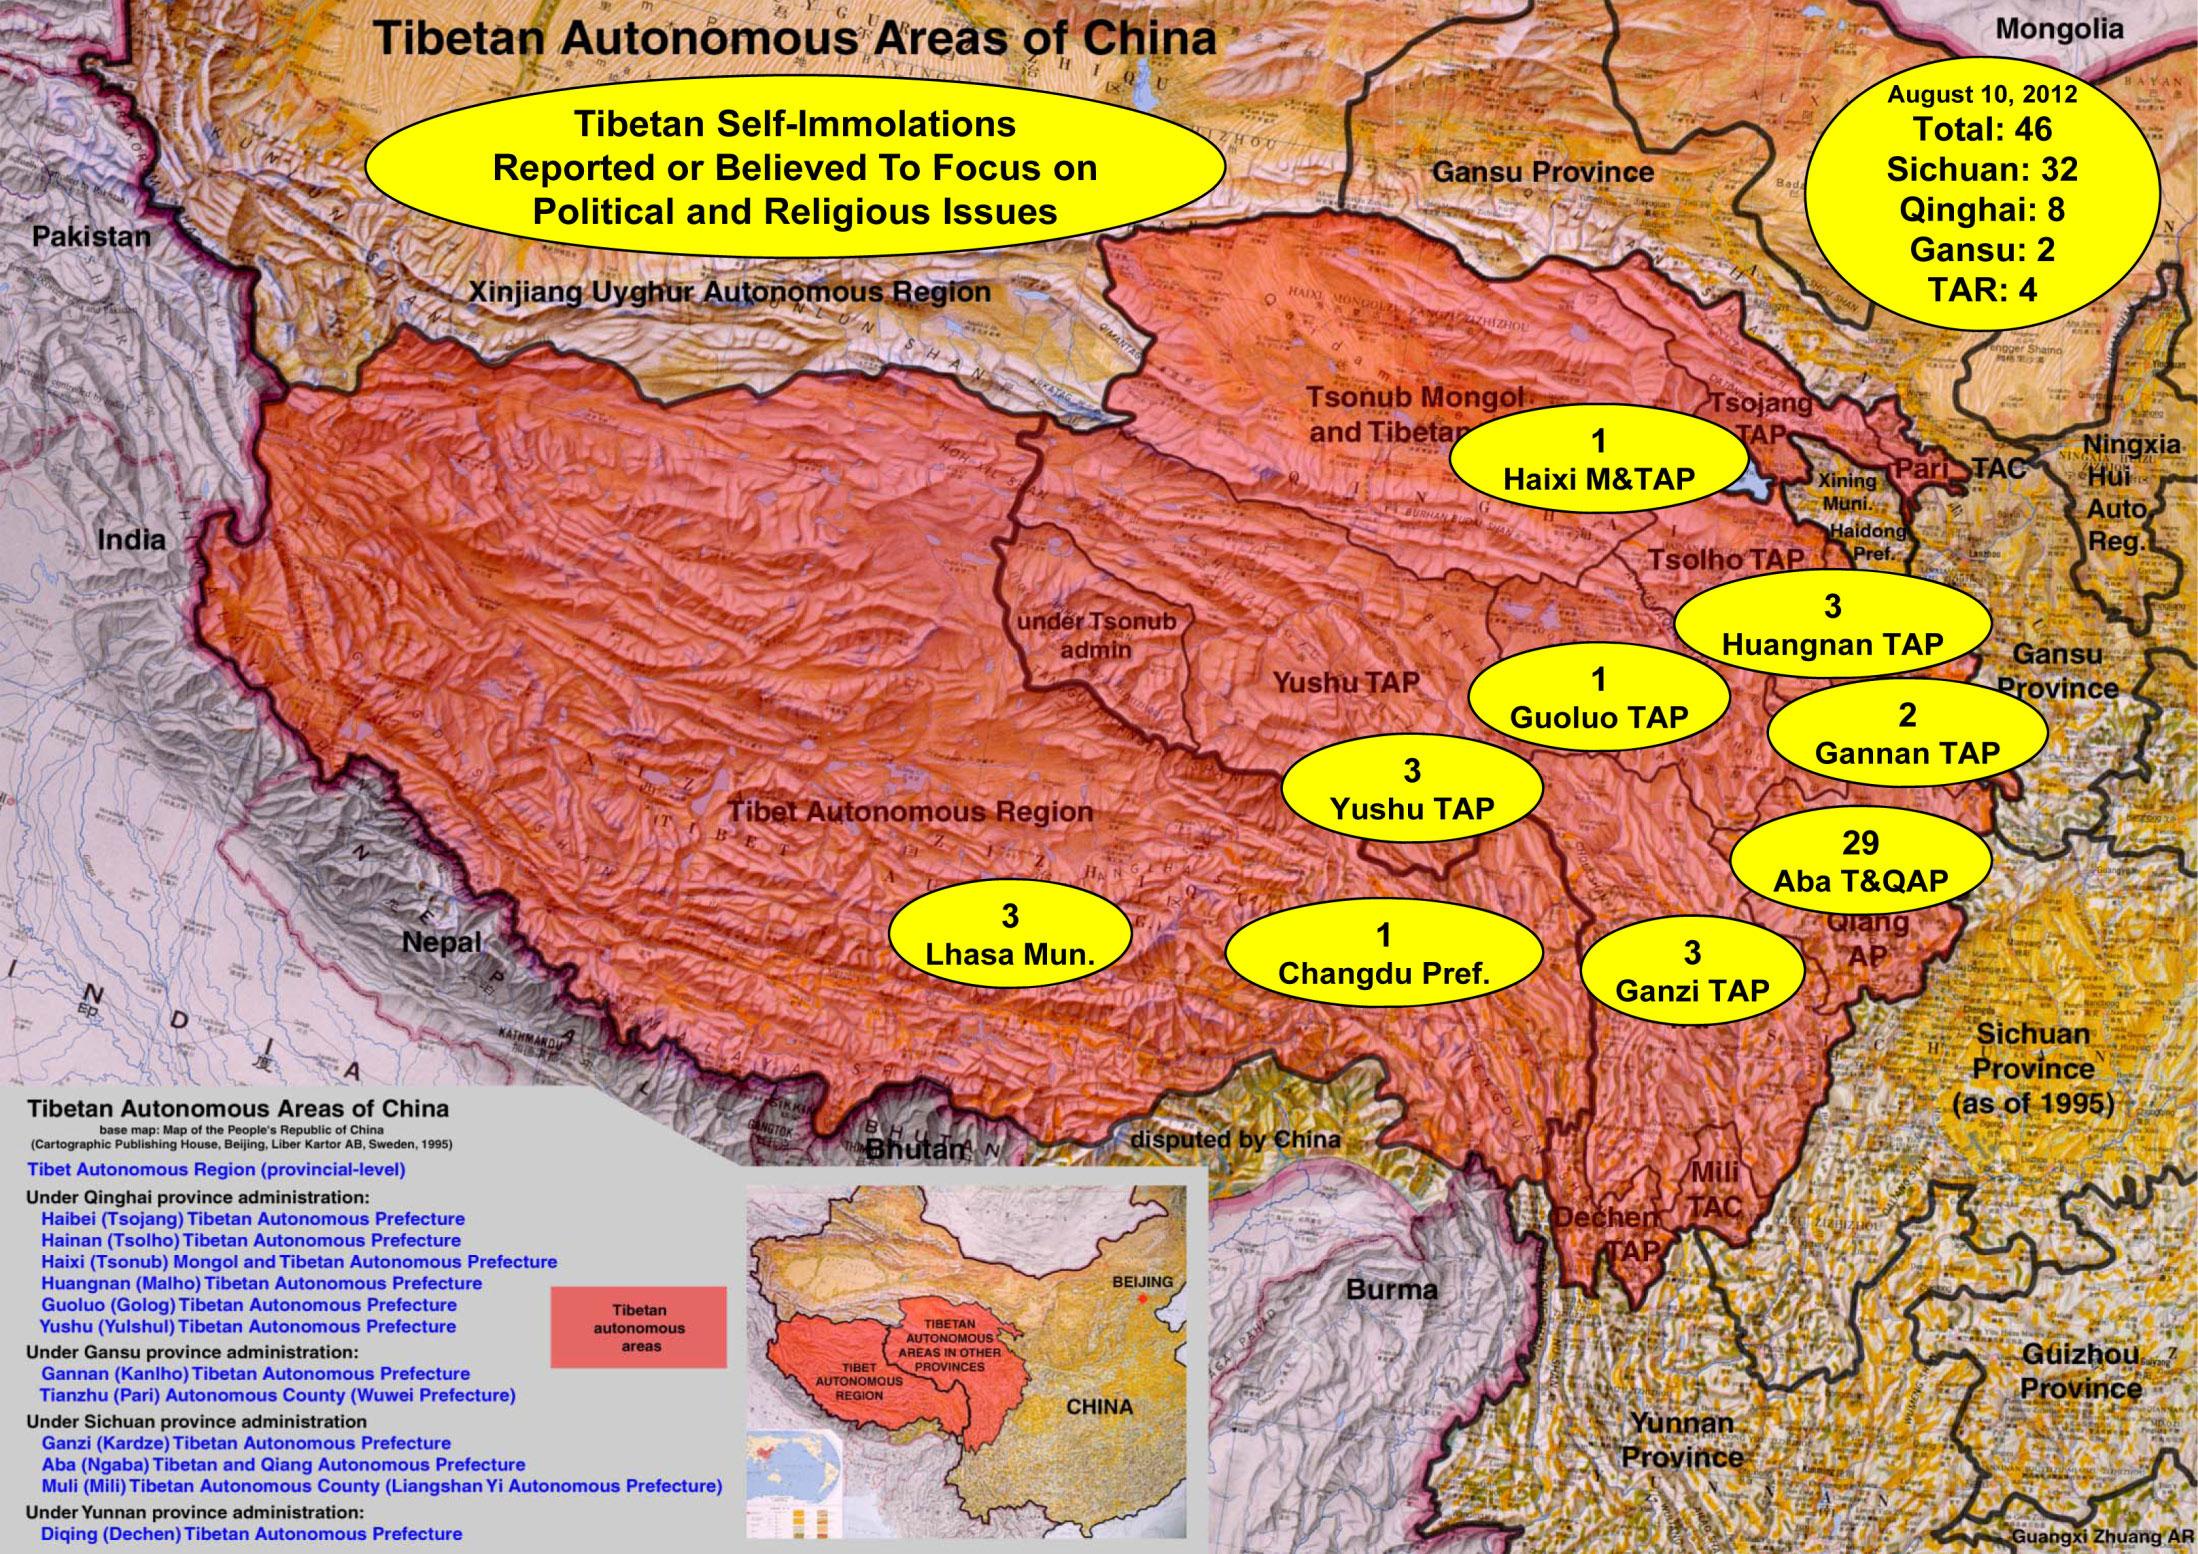 Tibetan Self-Immolation (February 27, 2009-August 10, 2012)